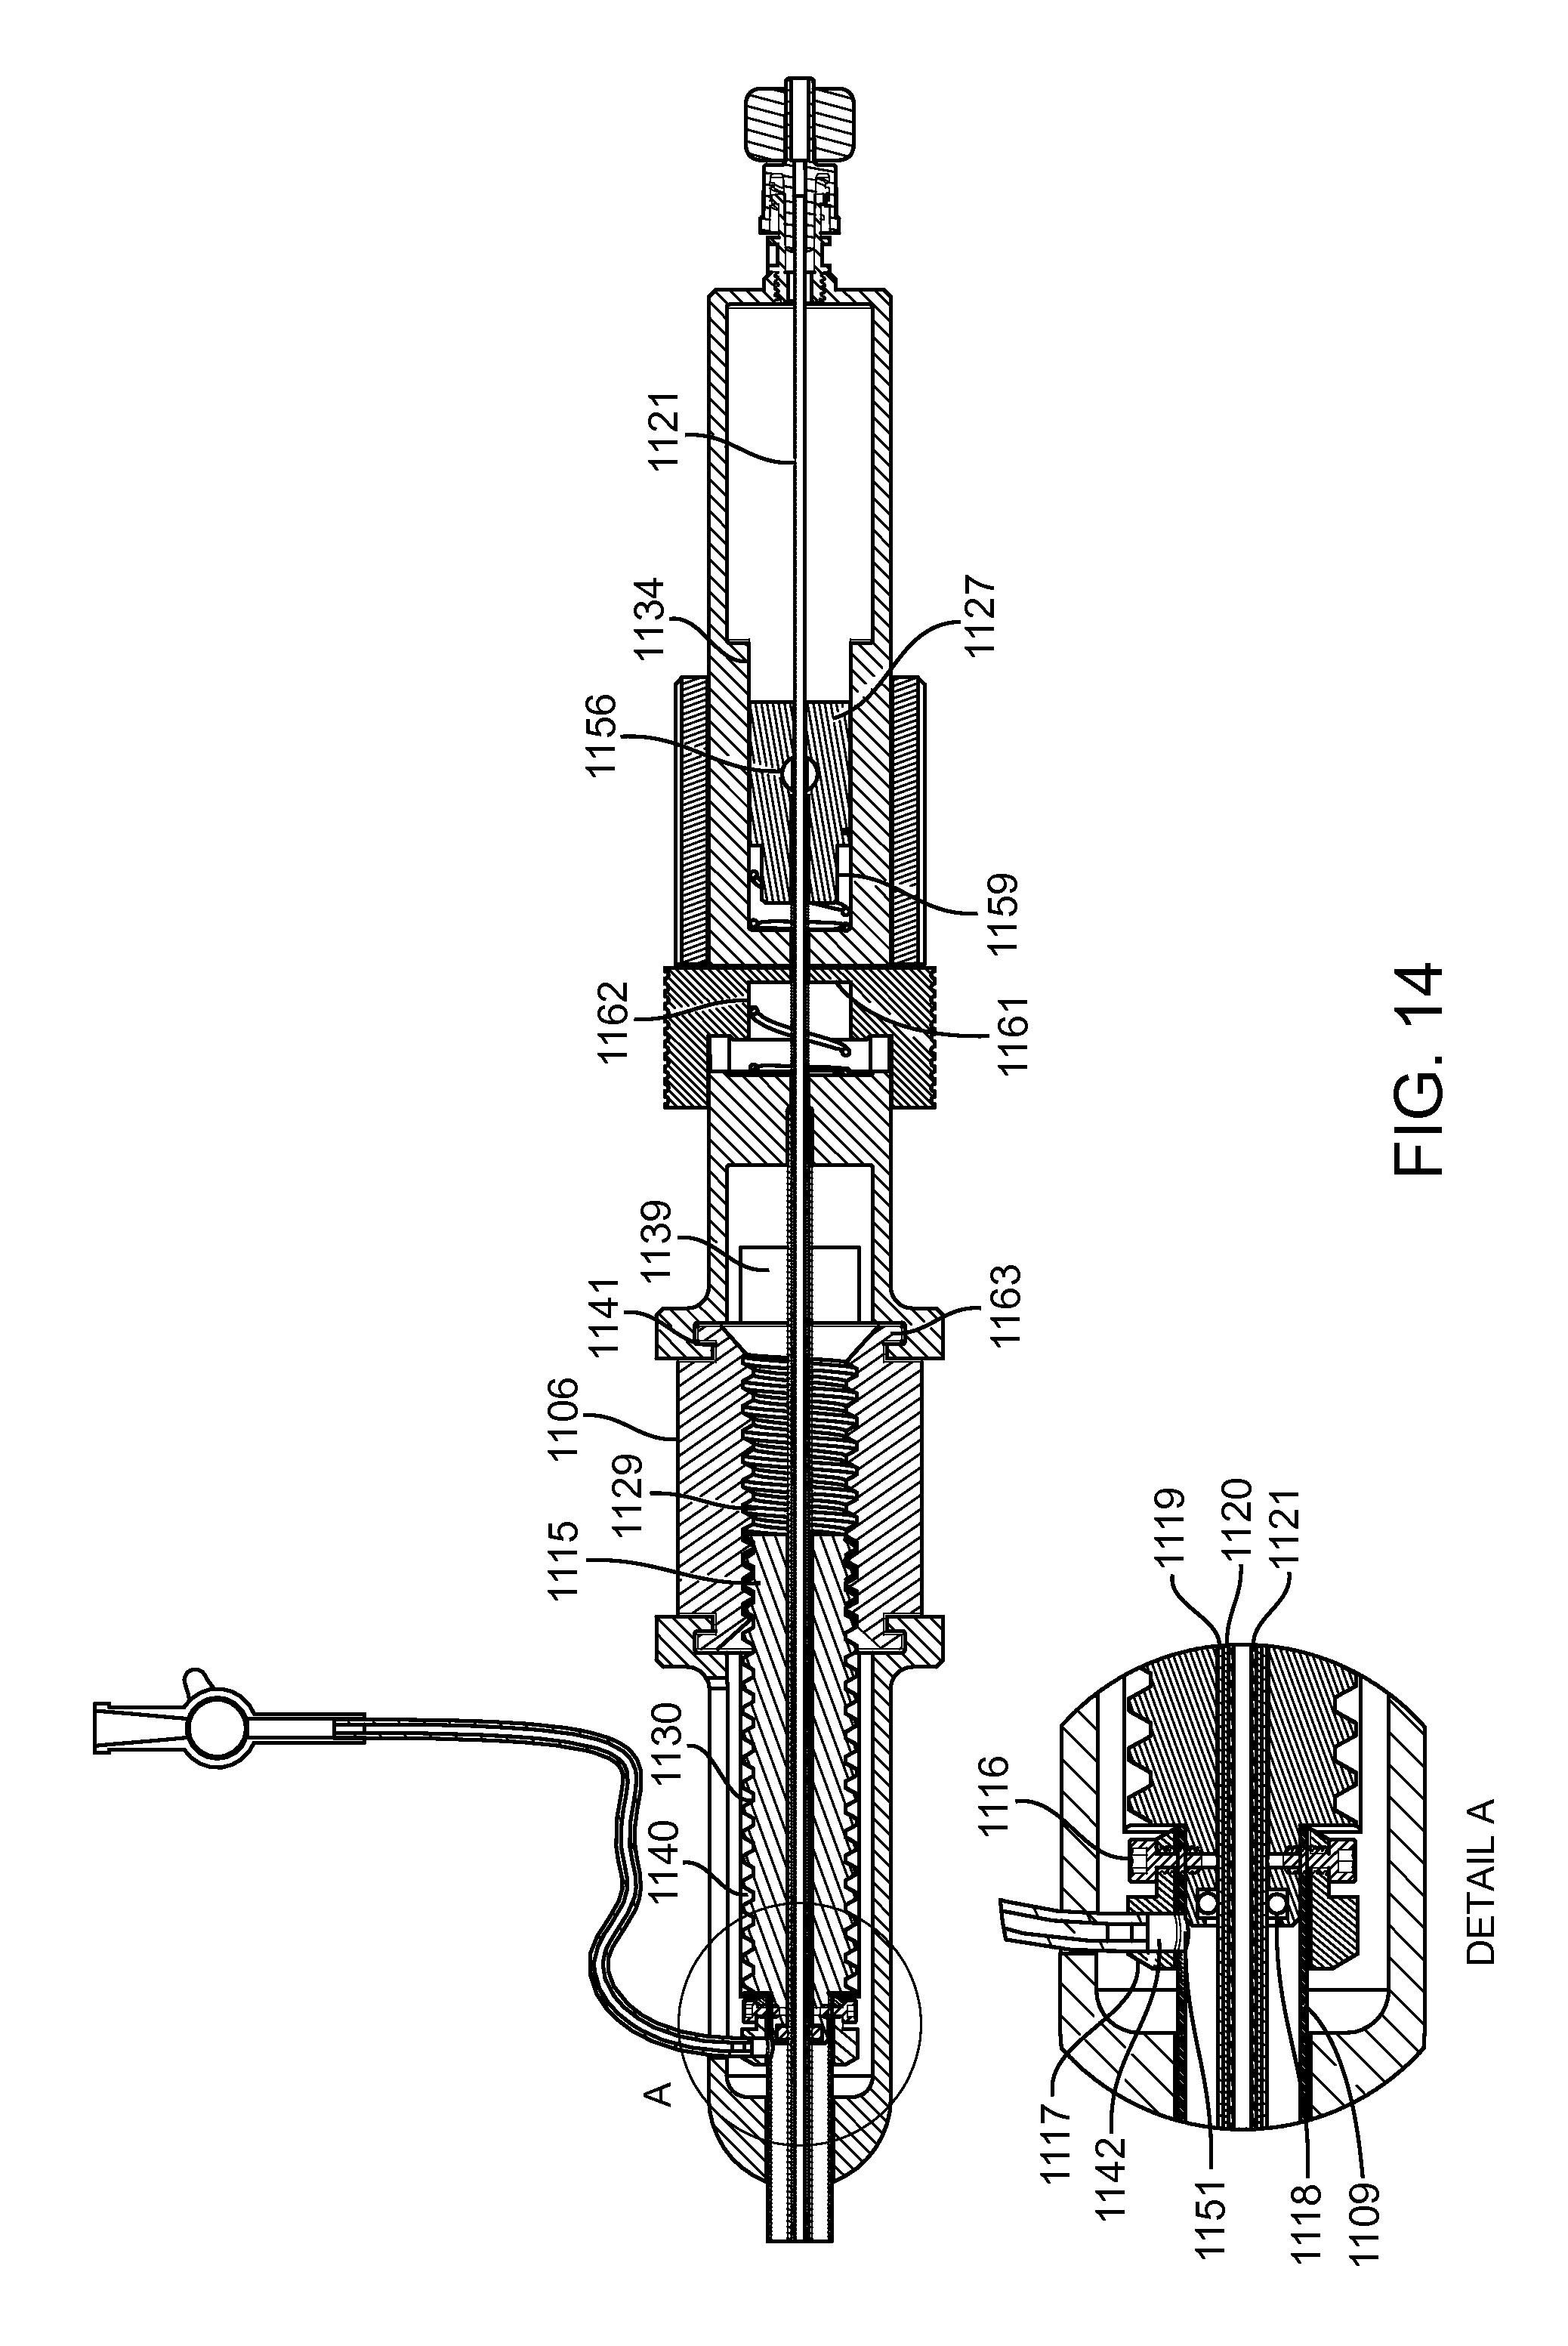 patent us20110319989 transcatheter mitral valve prosthesis